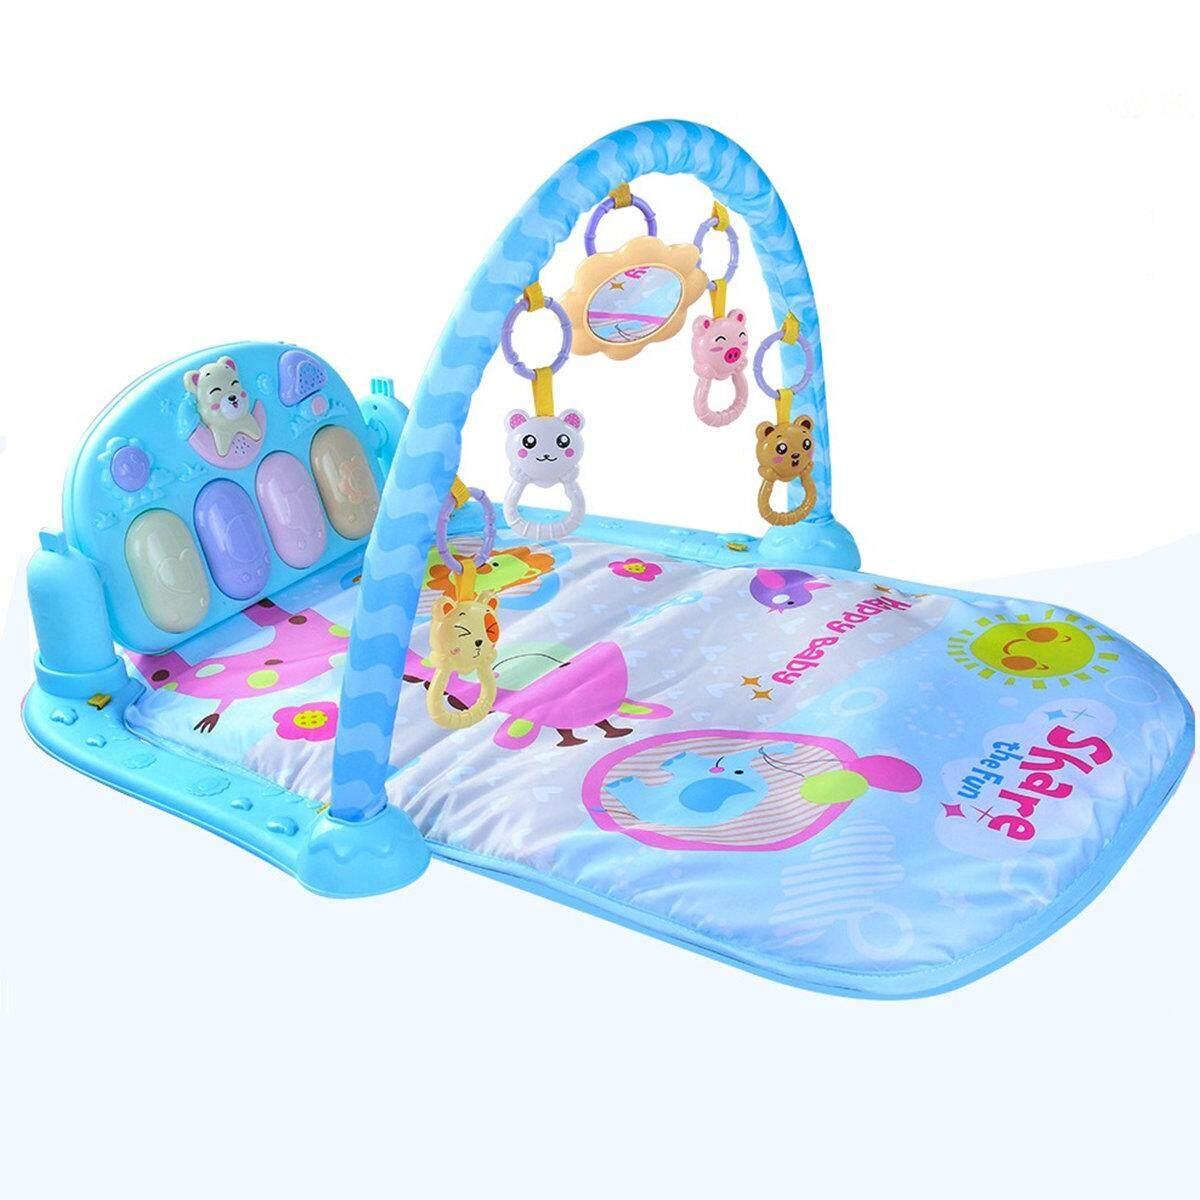 Hình ảnh Baby Gym Play Mat Lay & Play Fitness Music And Lights Fun Piano